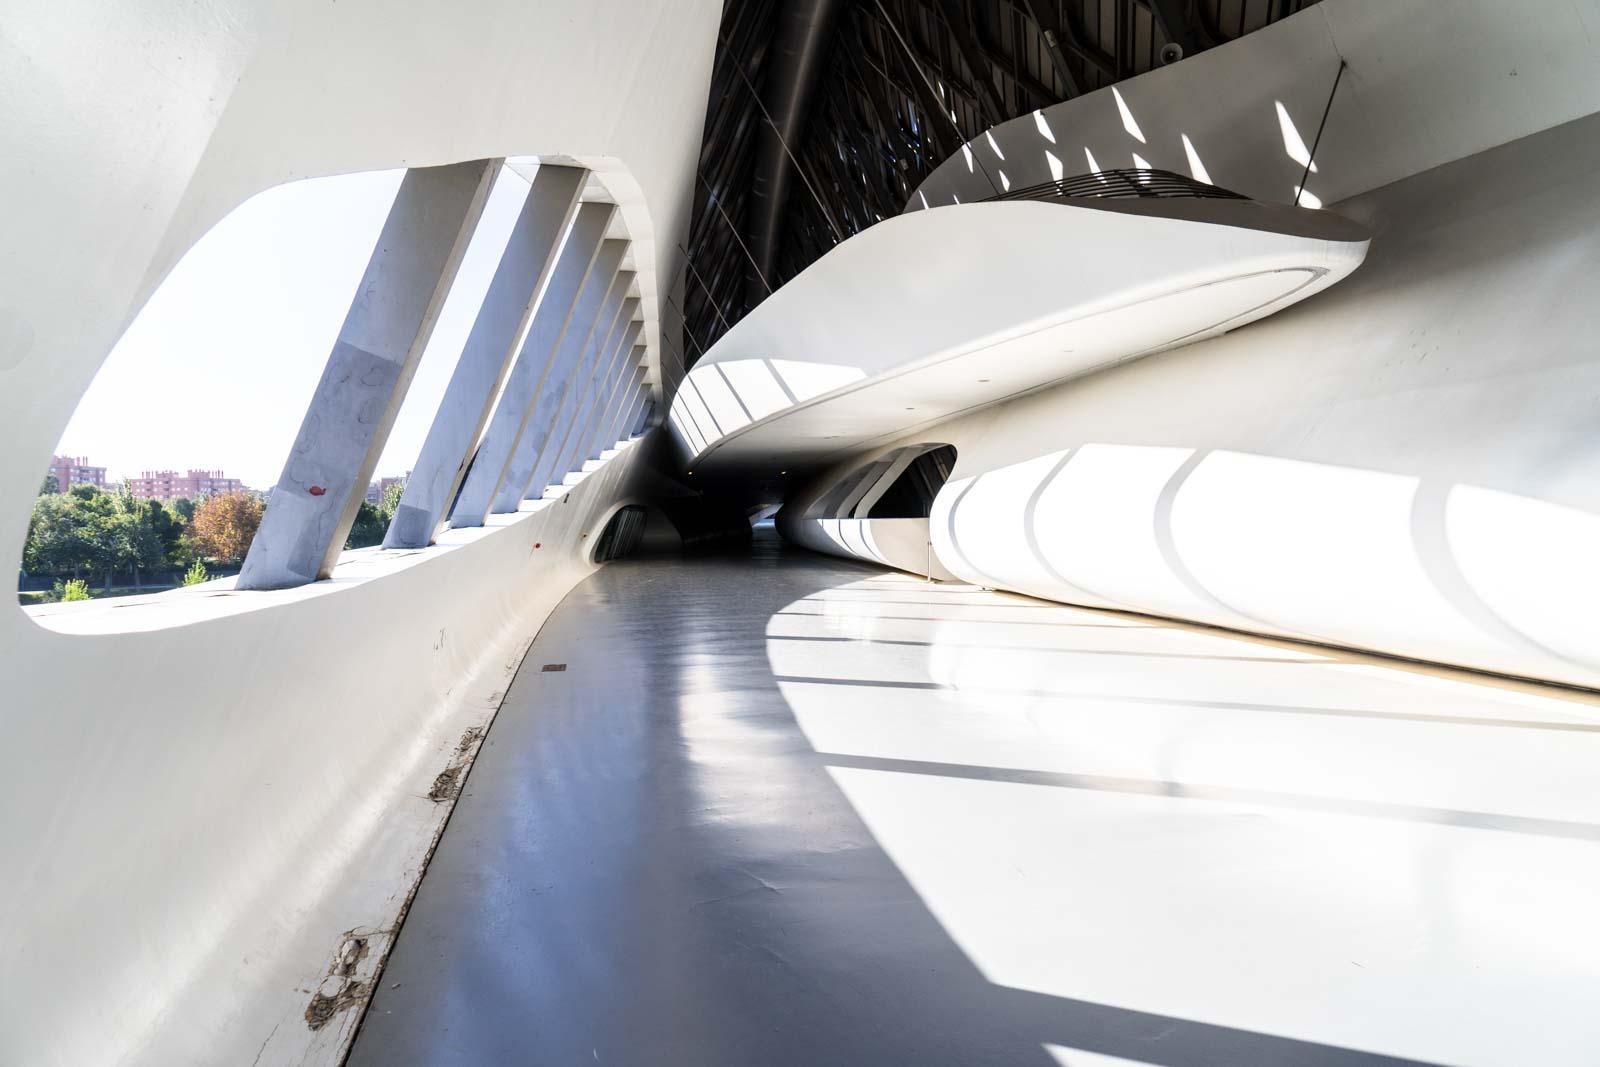 Expo 2008, Zaragoza, Spain